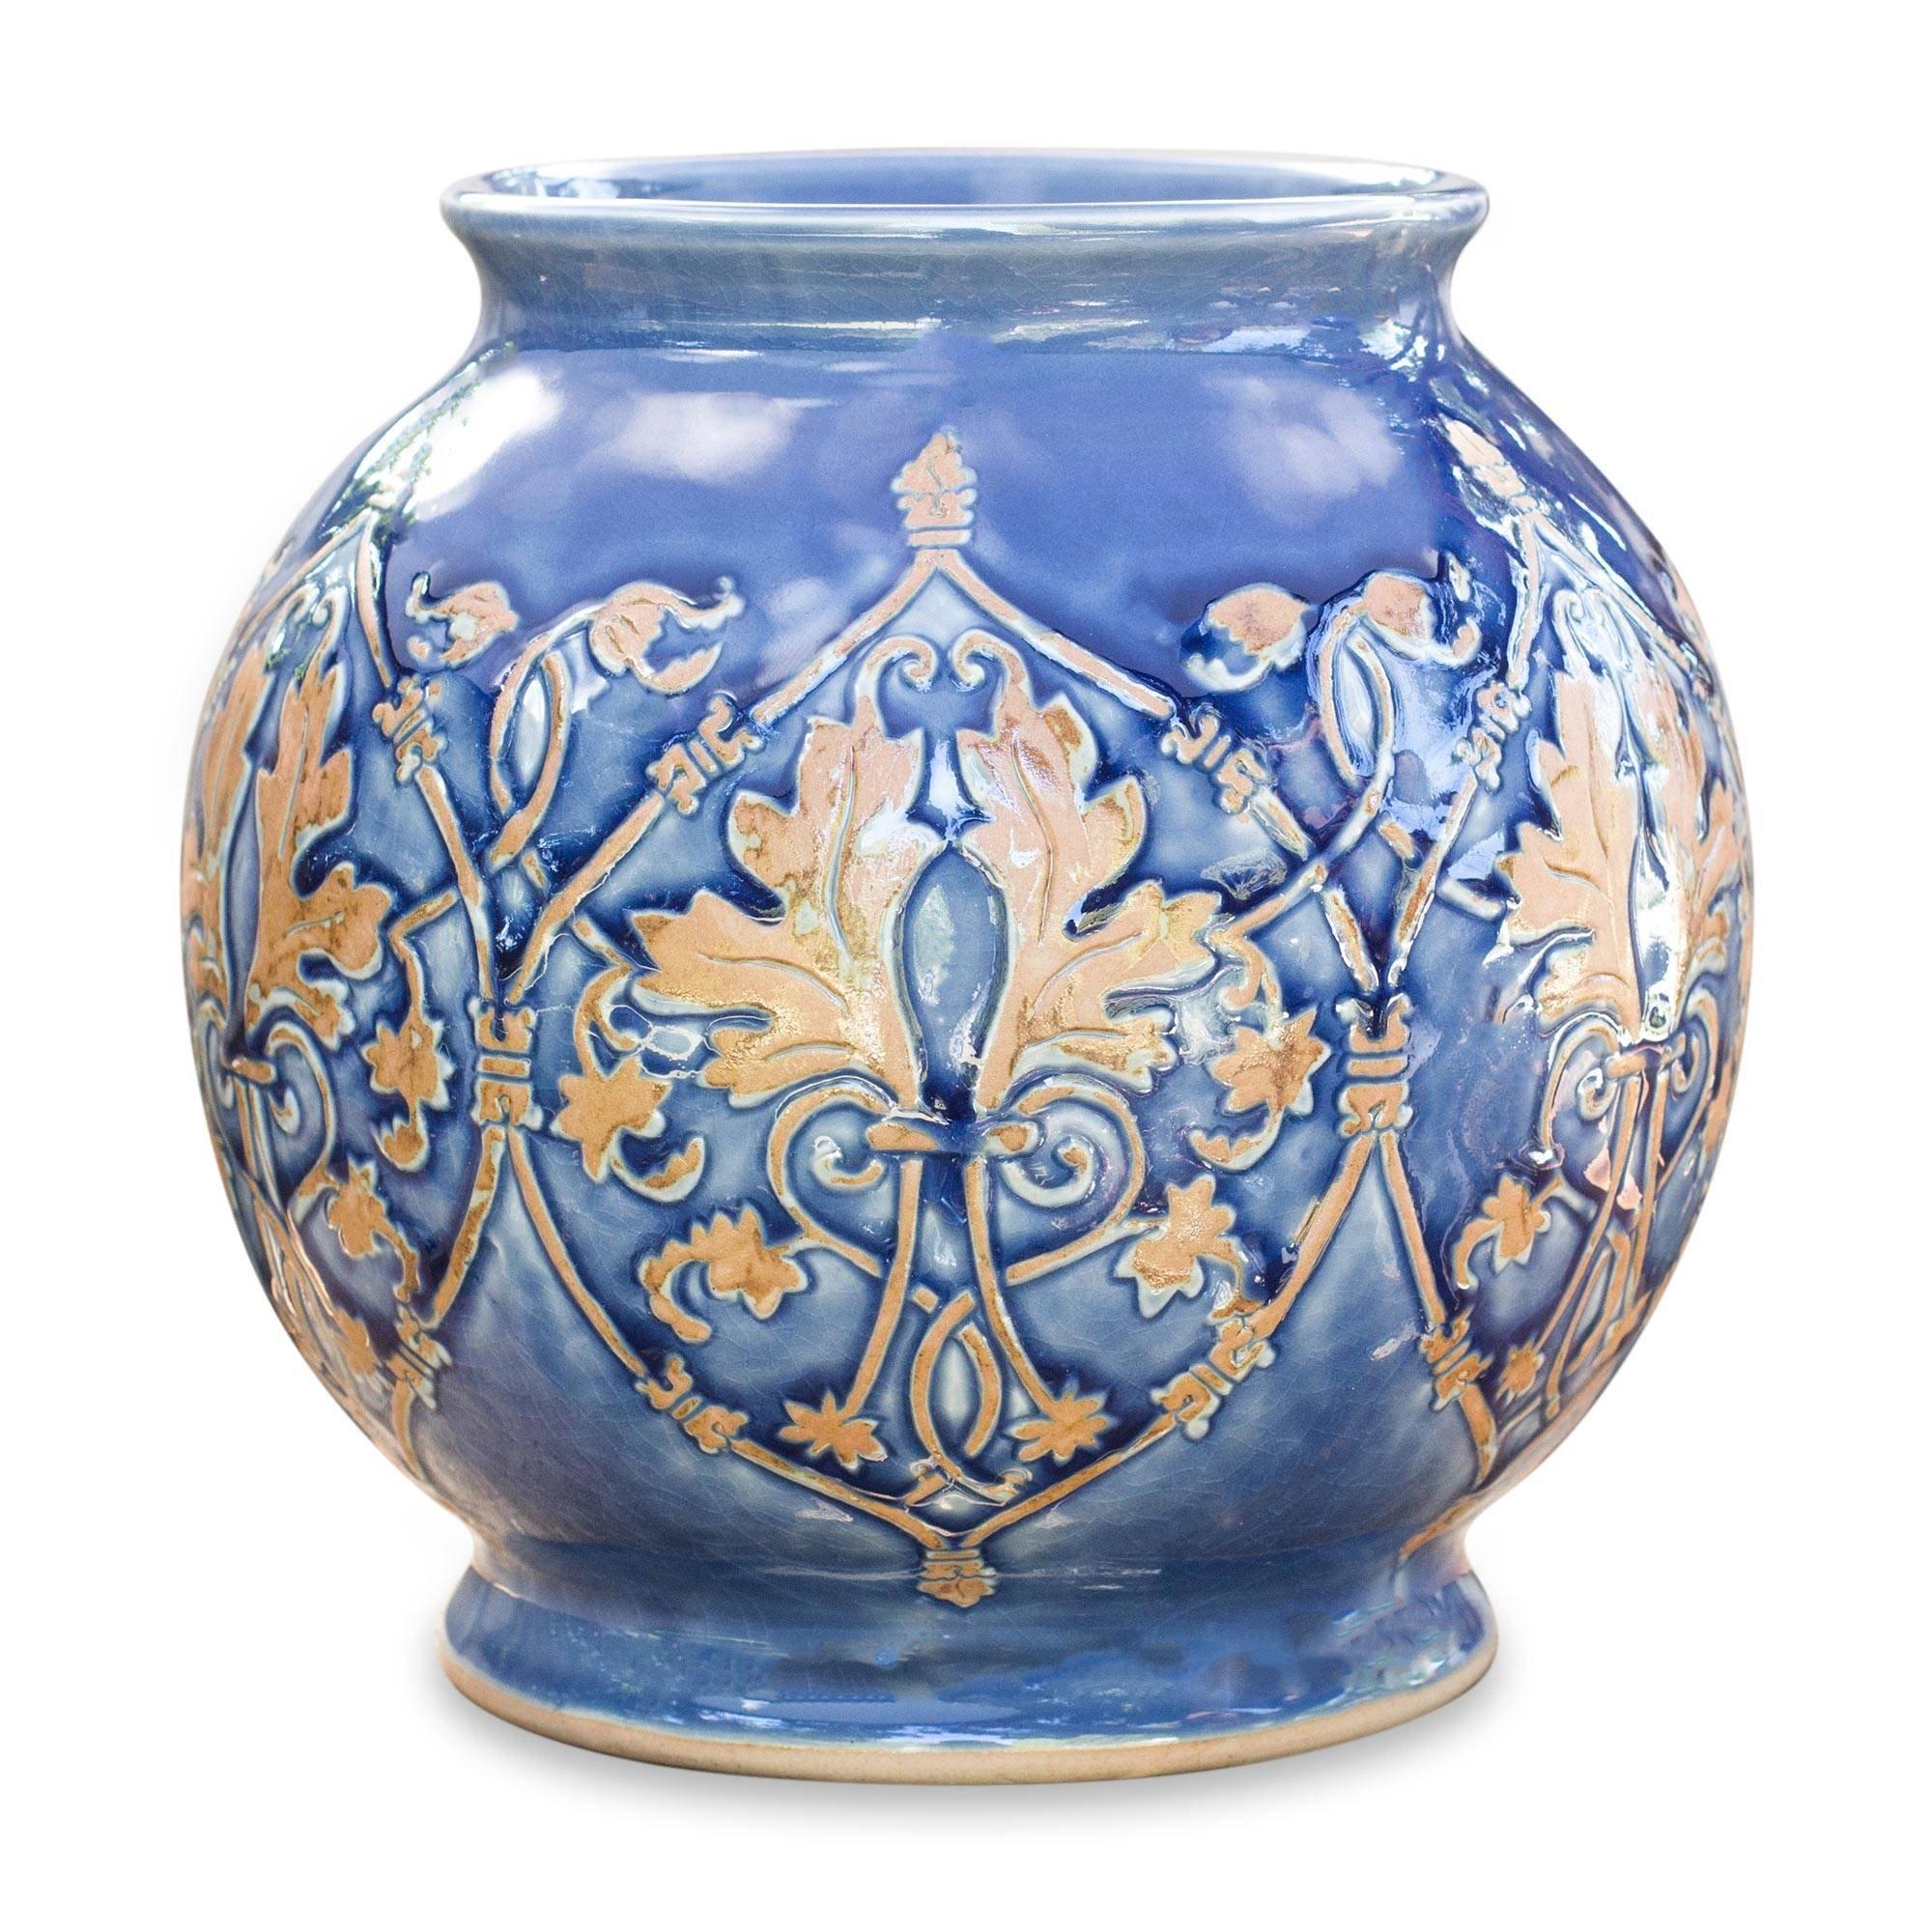 NOVICA Celadon Ceramic Vase, Blue 'Thai Sapphire' by NOVICA